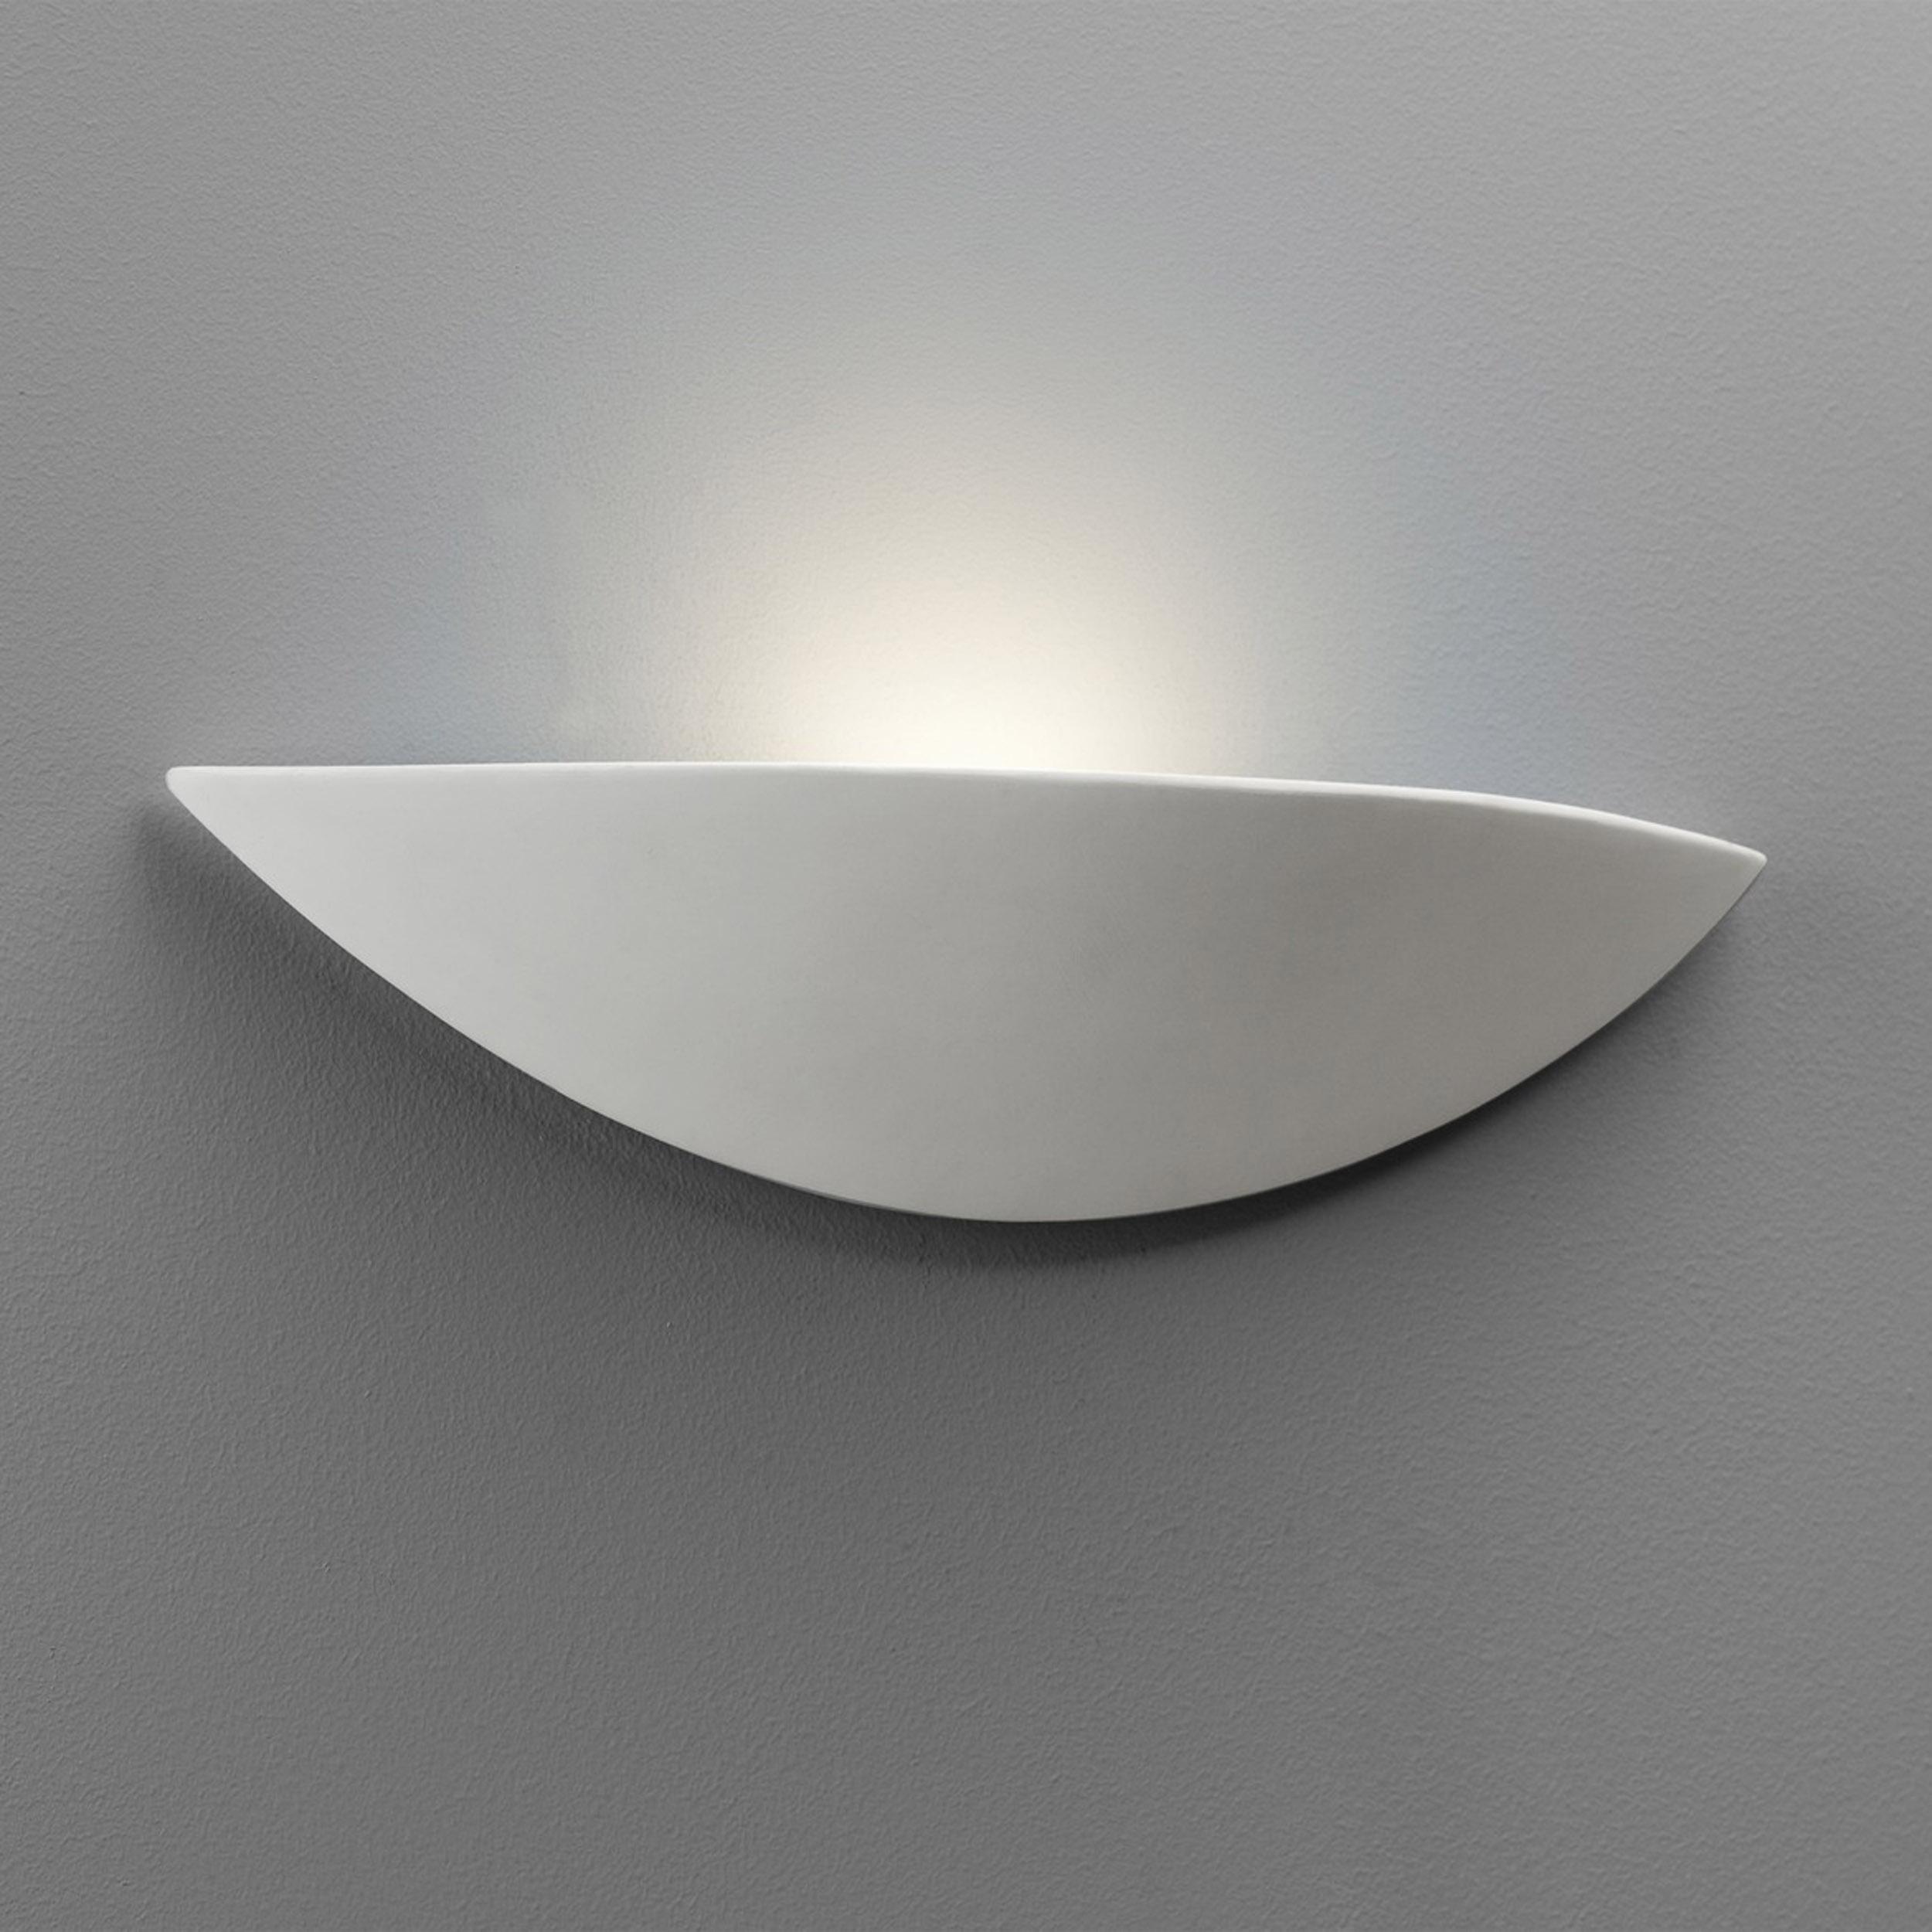 Astro Slice Wall Light Ceramic